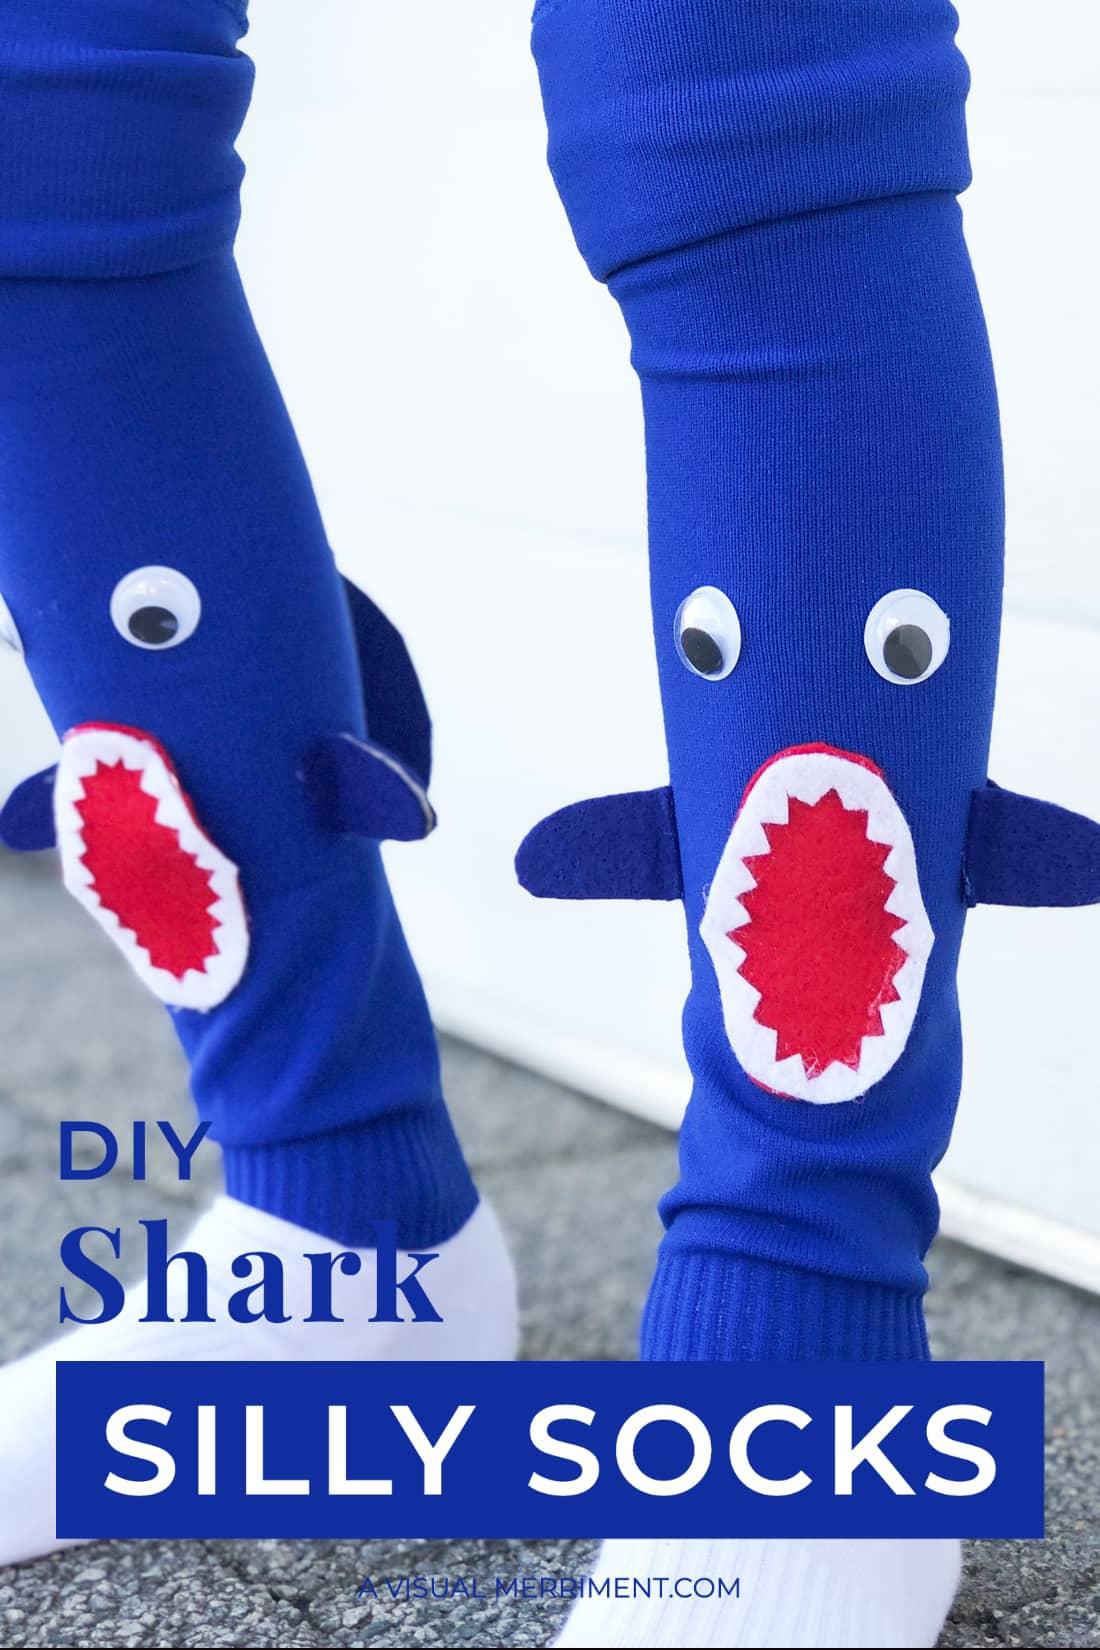 DIY shark silly socks intro graphic